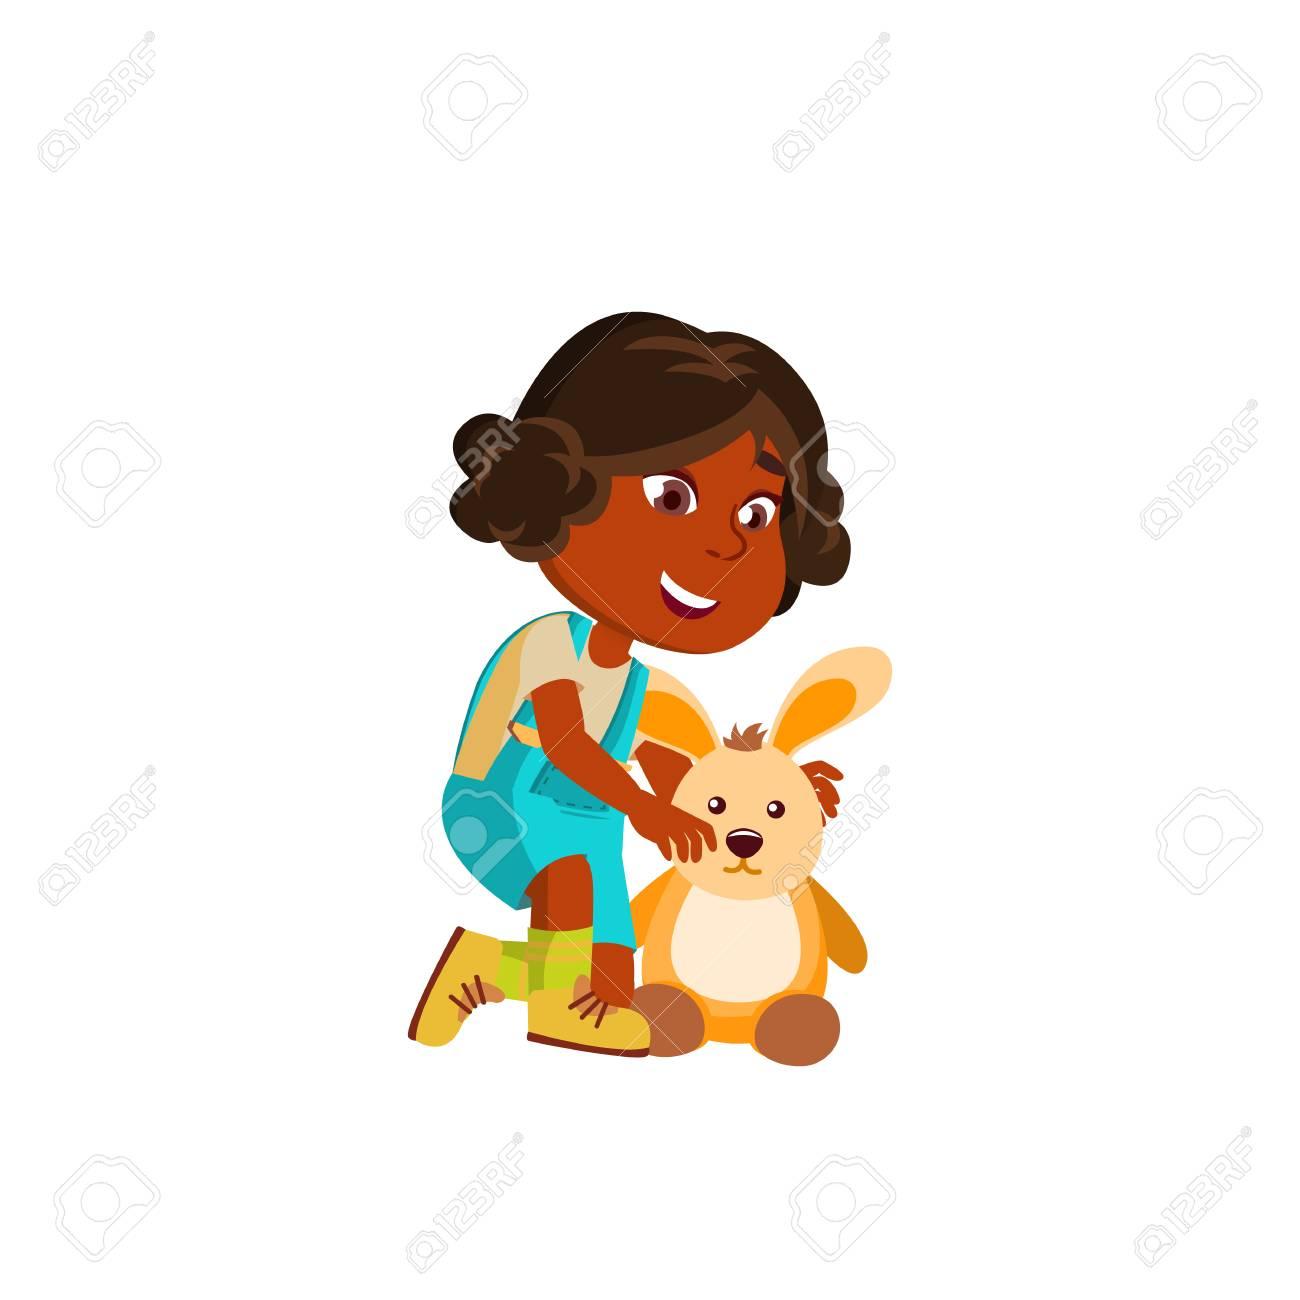 Indian Girl Kindergarten Kid Poses Vector Character Playing